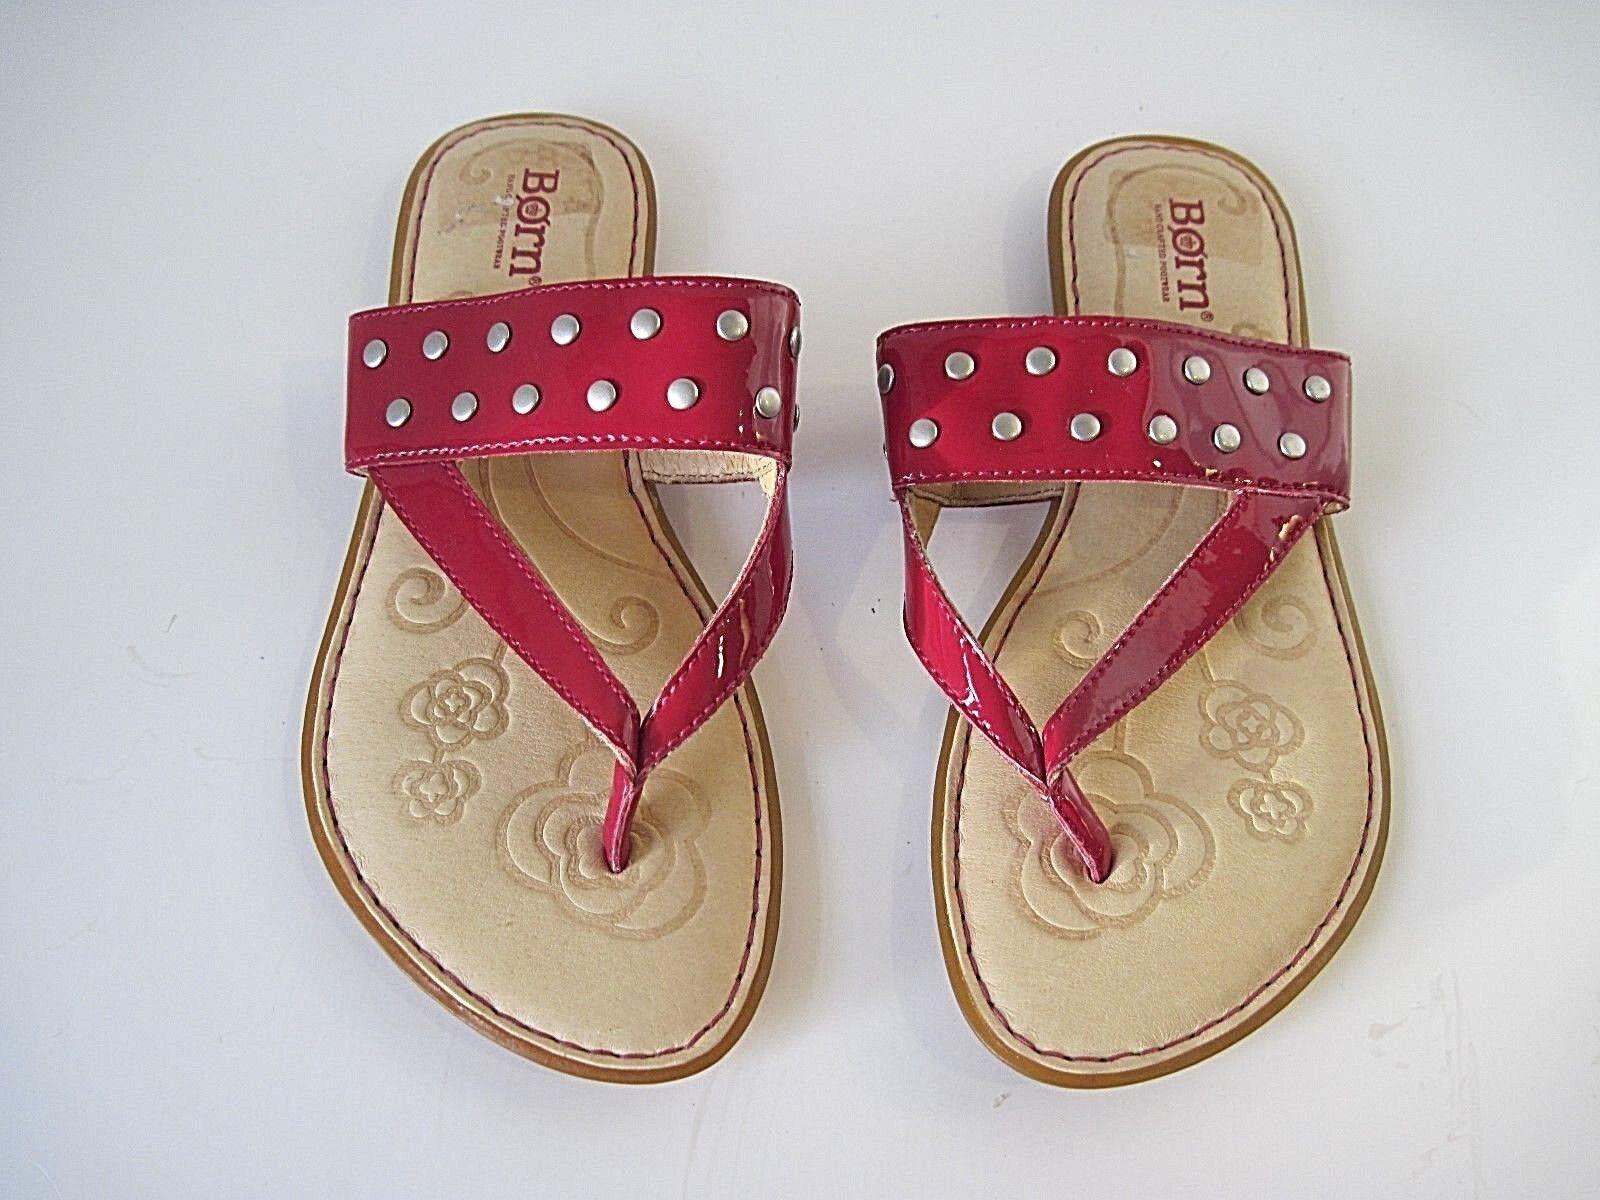 cc7daae6e0f00 BORN KRYSTEN Burgundy Patent Leather Thong Sandal Slide Flat B42105 6 36.5  NEW